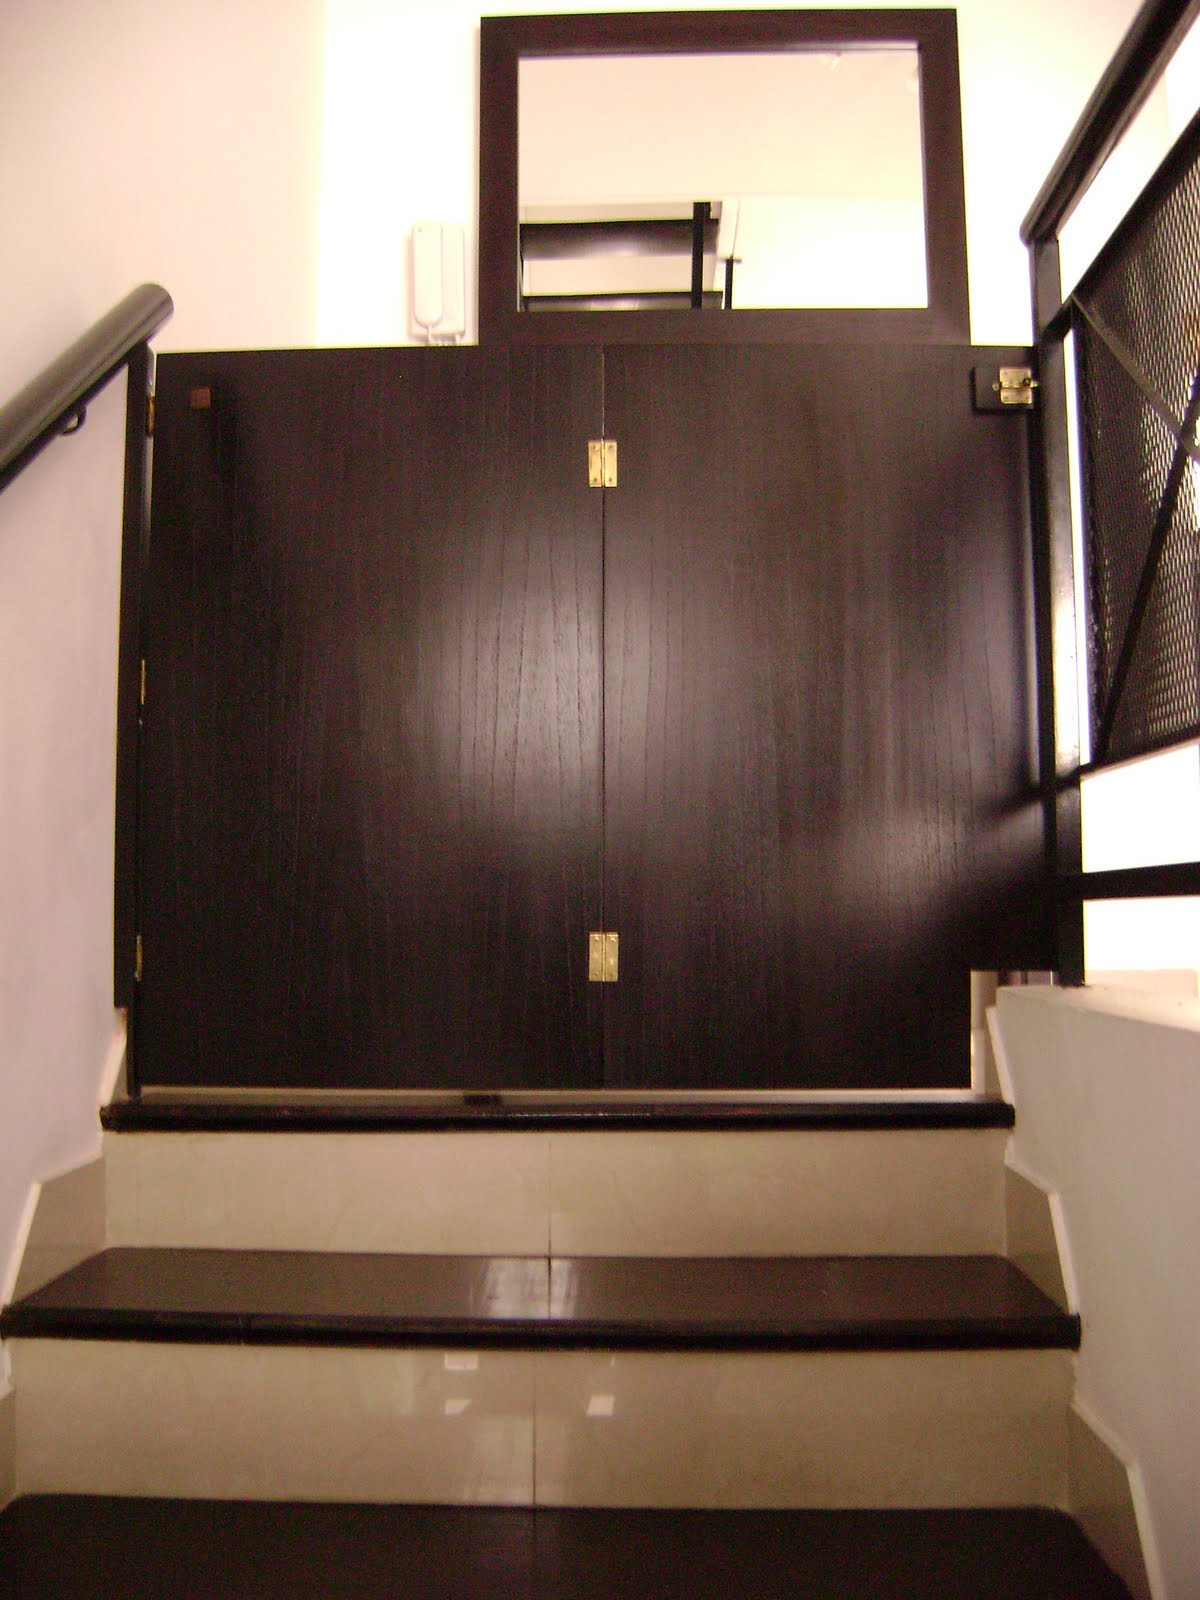 Muebles a medida decocarpinteria puerta plegable en - Puertas de escalera ...